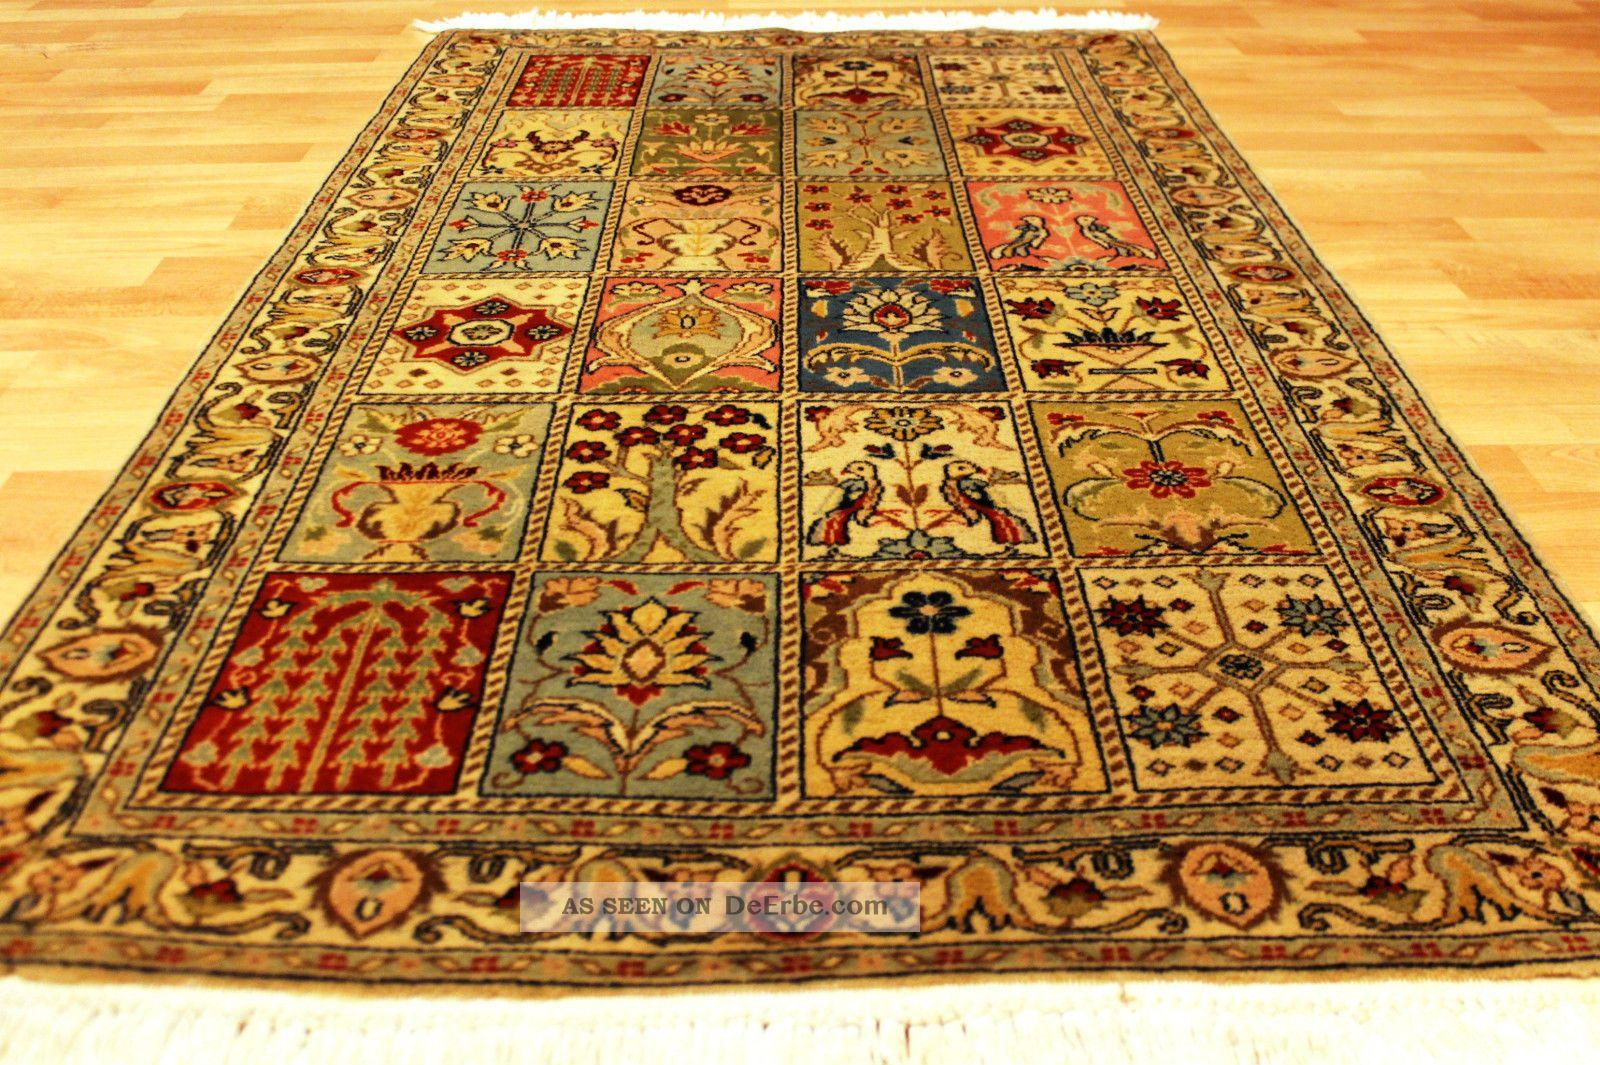 alter felder bilder garten teppich 165x92cm orient top tappeto rug 3542. Black Bedroom Furniture Sets. Home Design Ideas